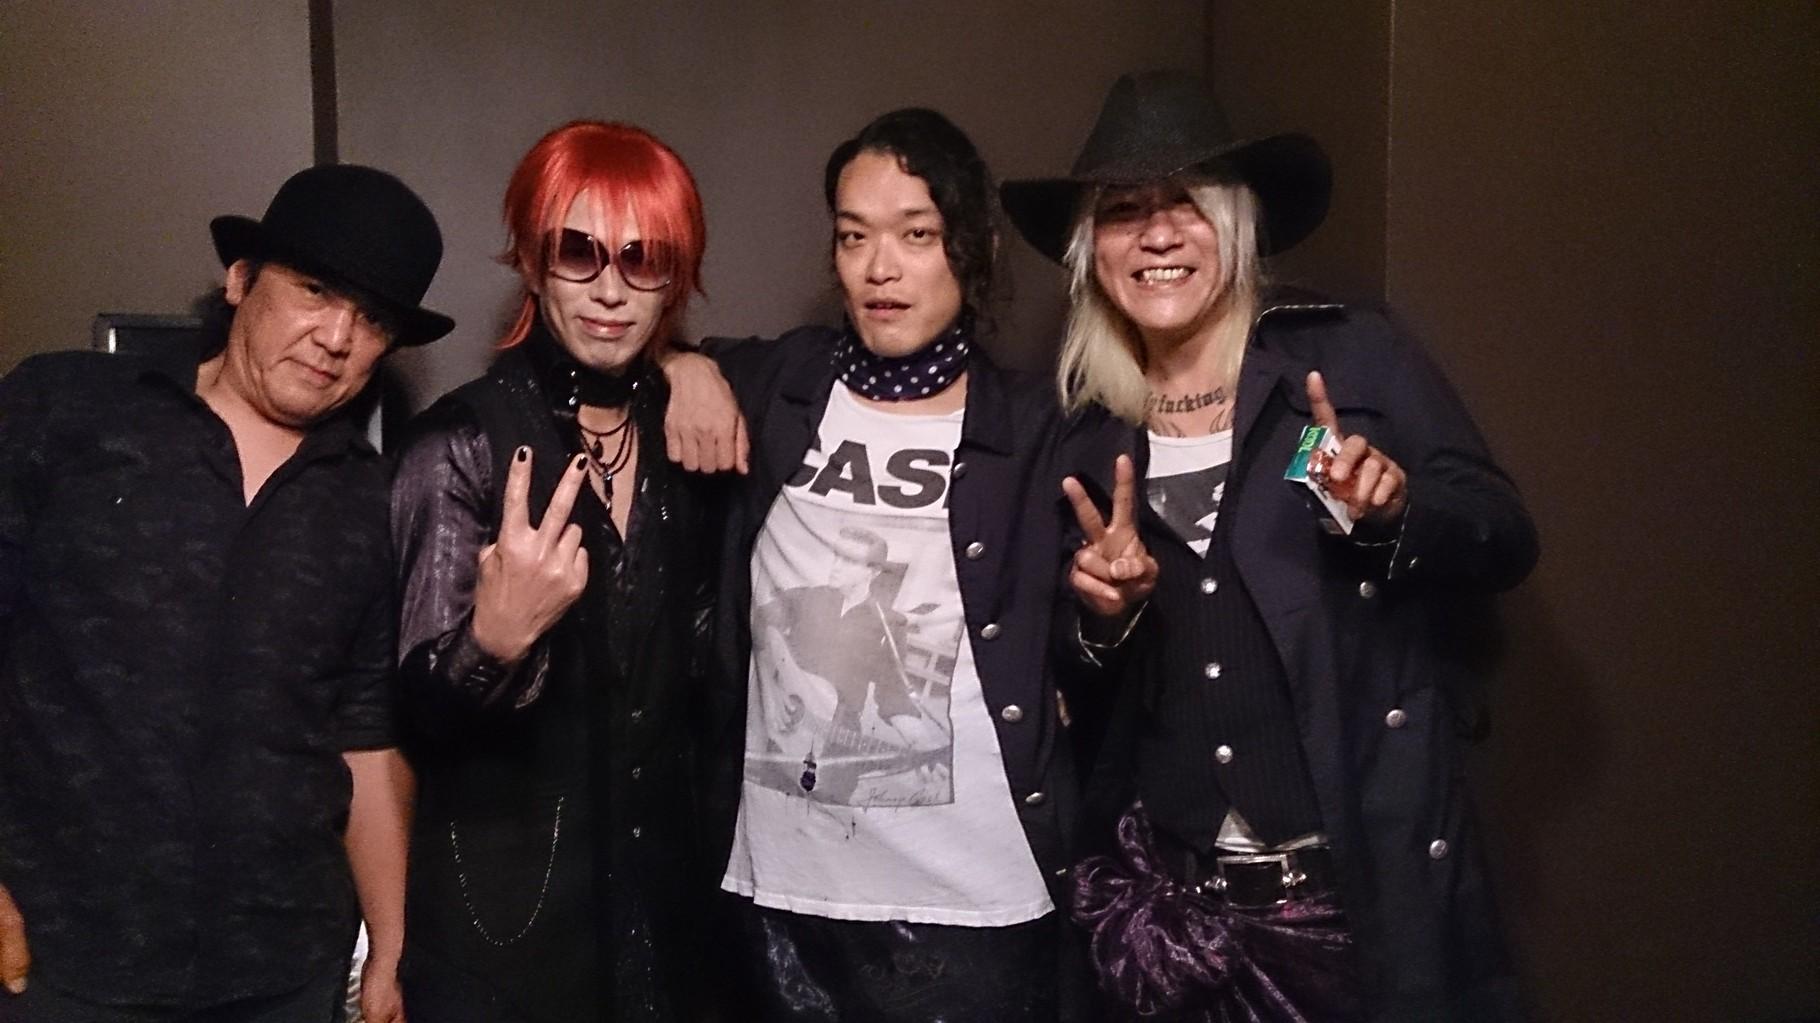 dead pan brothersさん & 二井原 教仁さんと記念写真(^-^)